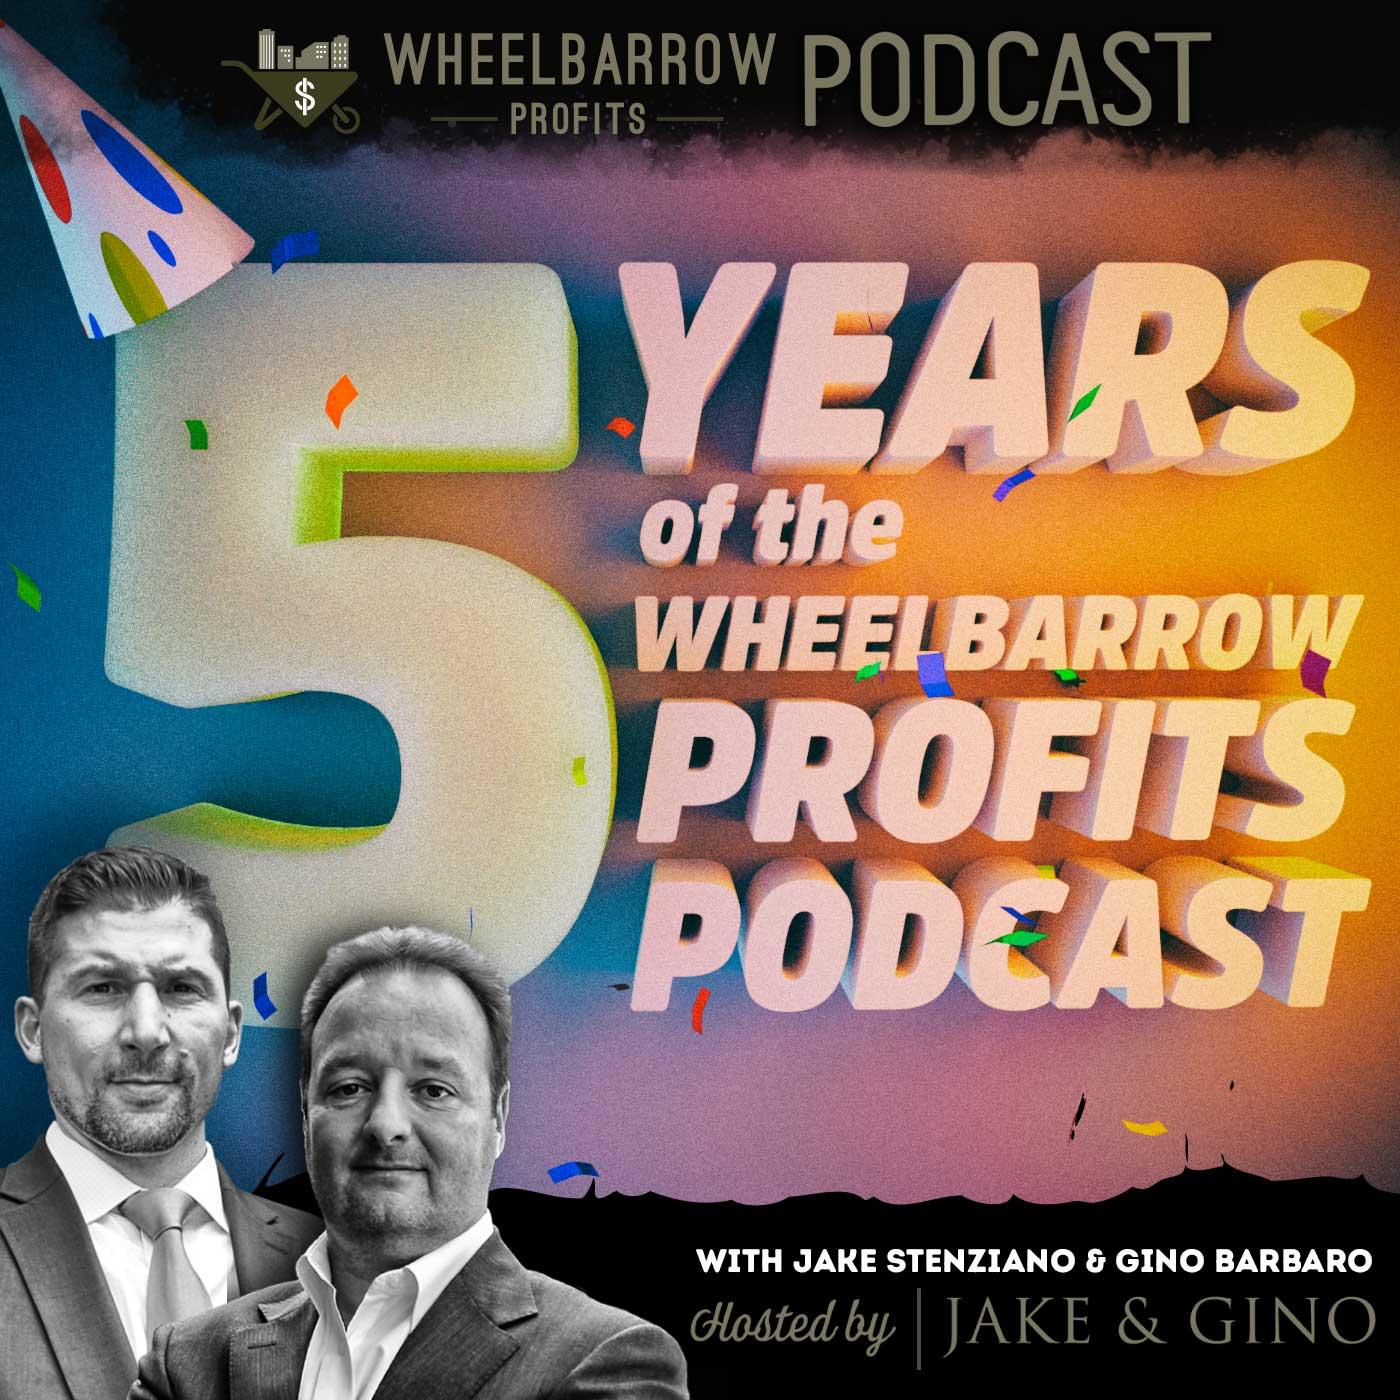 WBP - 5 Year Anniversary Episode with Jake and Gino